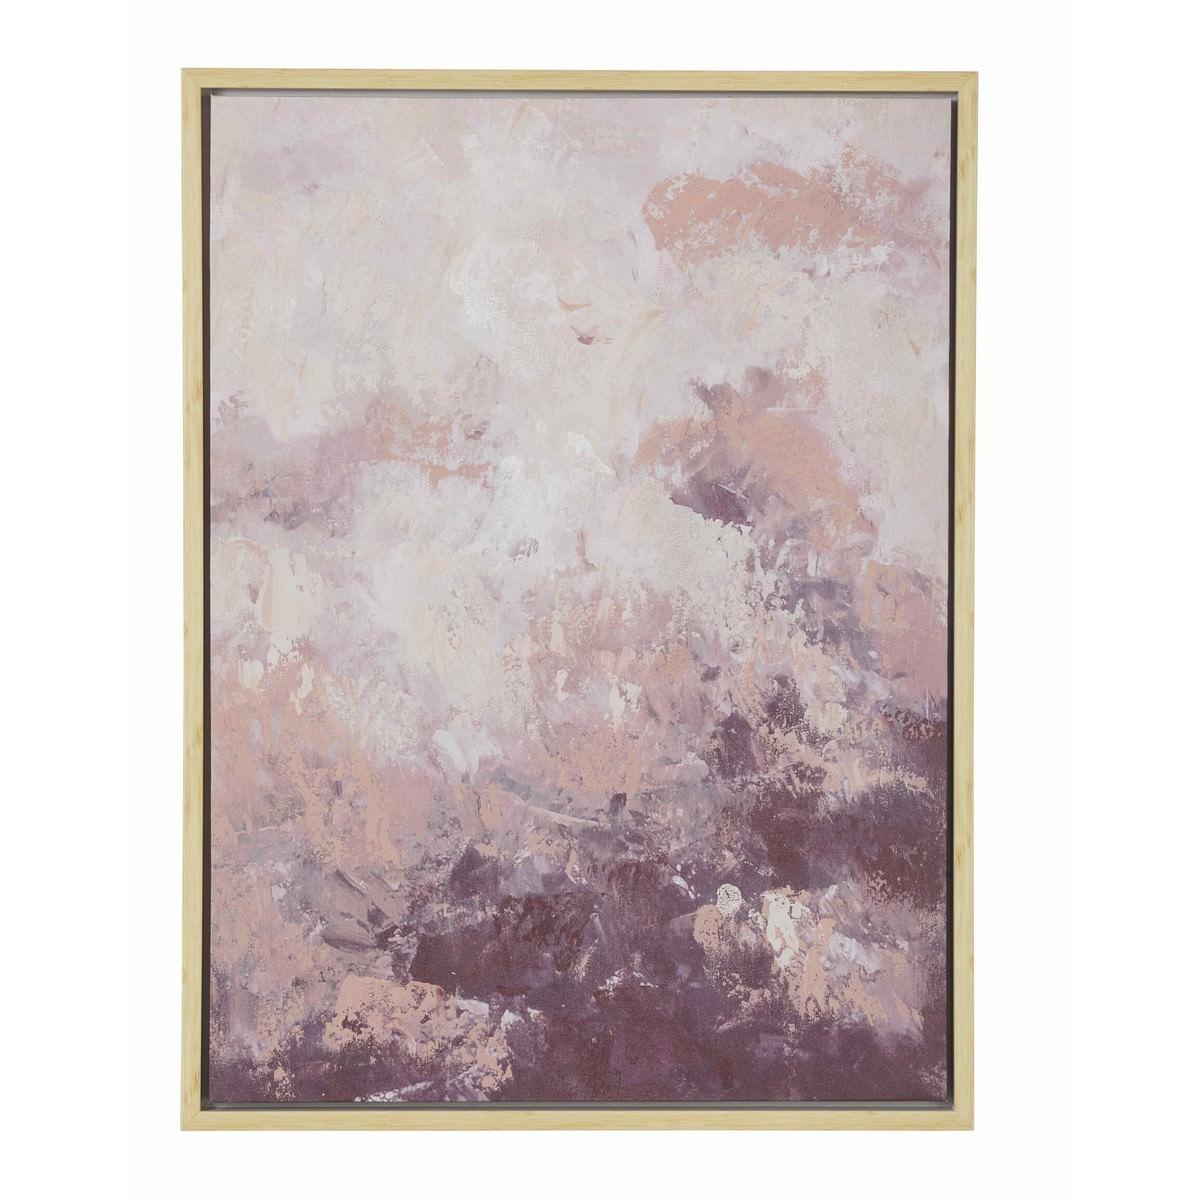 Noda Handmade Framed Oil Painting Canvas Wall Art, 80cm